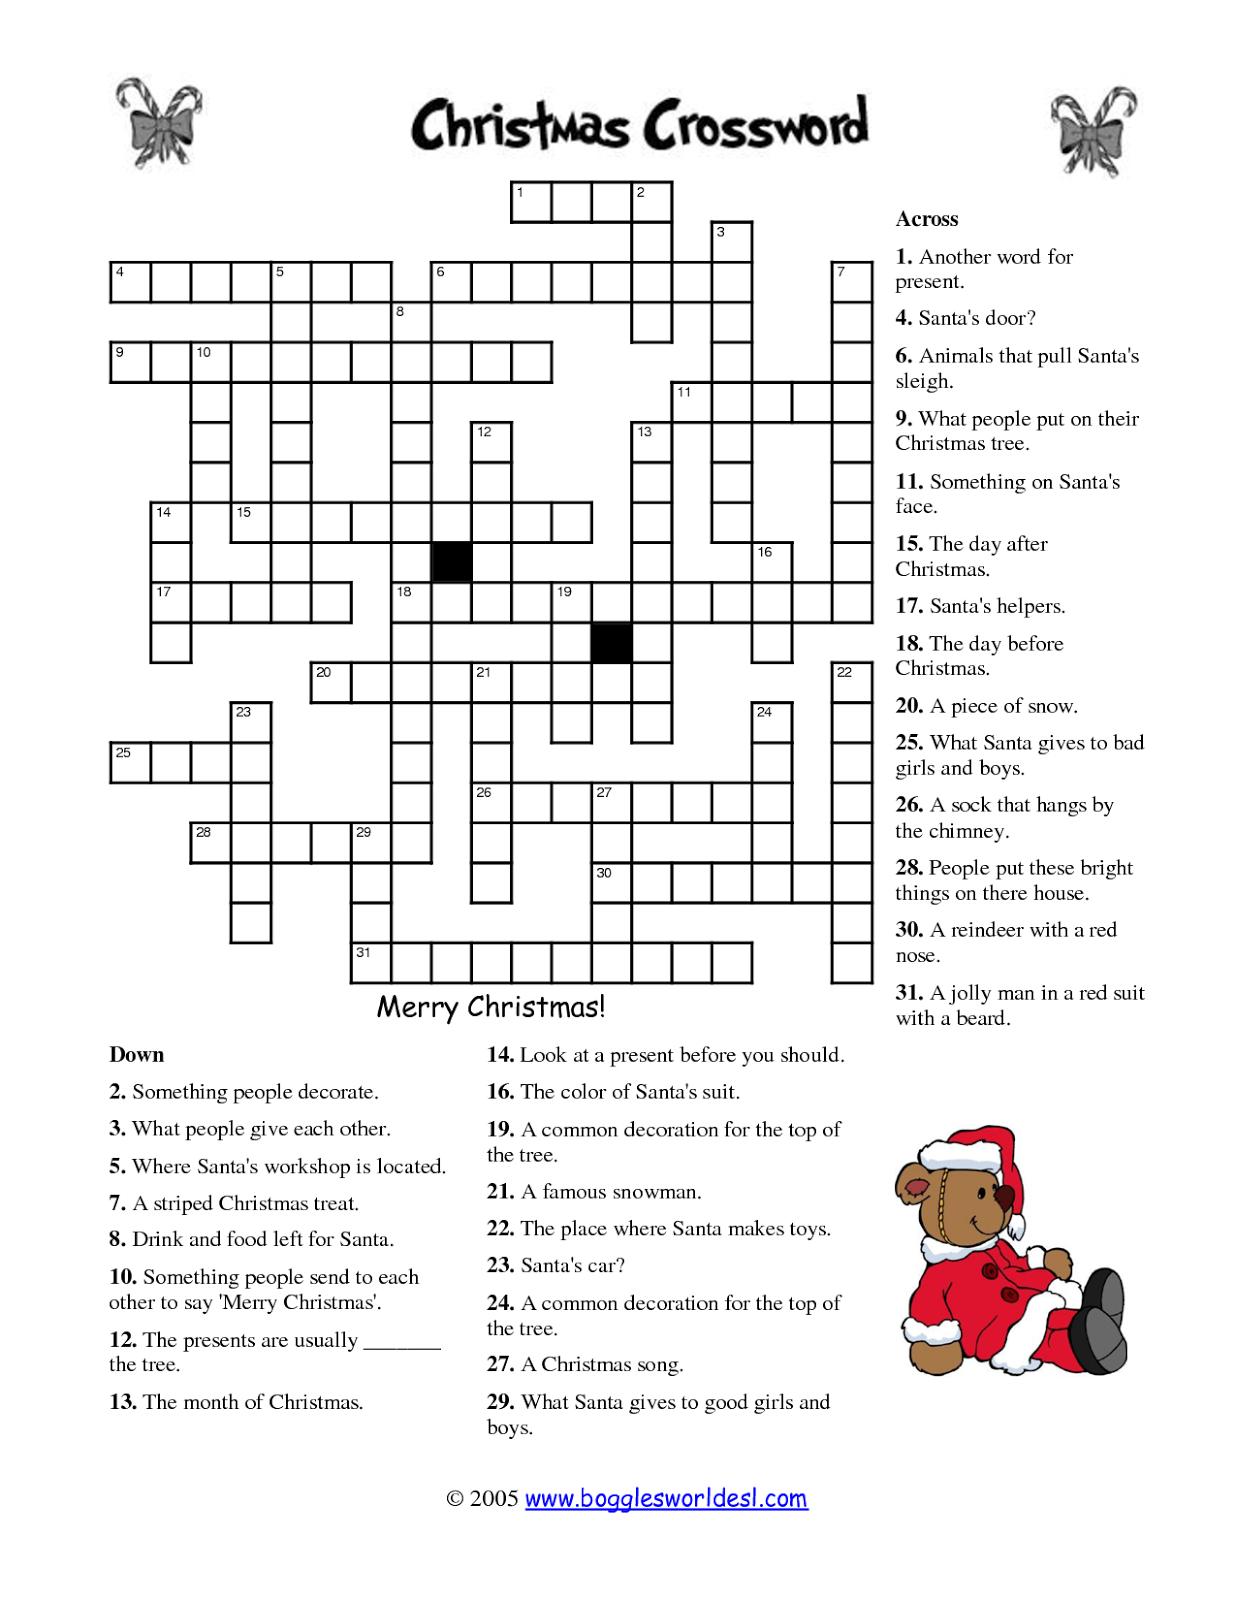 Free Printable Cards: Free Printable Crossword Puzzles | Printables - Printable Crosswords For 14 Year Olds